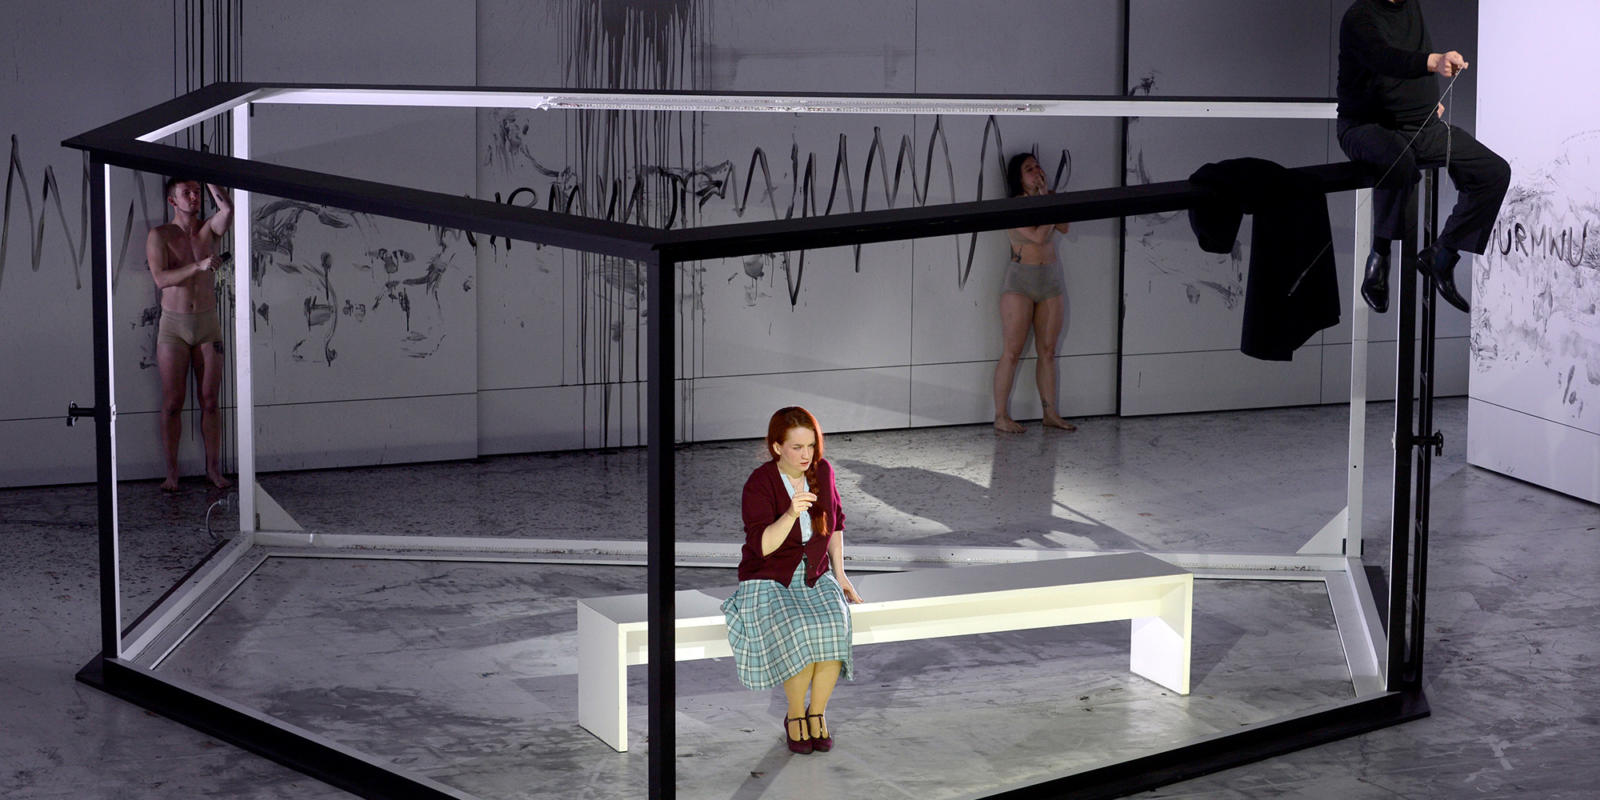 ENO1920 Luisa Miller: Izabela Matula as Luisa in Oper Wuppertal's production (c) Jens Grossmann